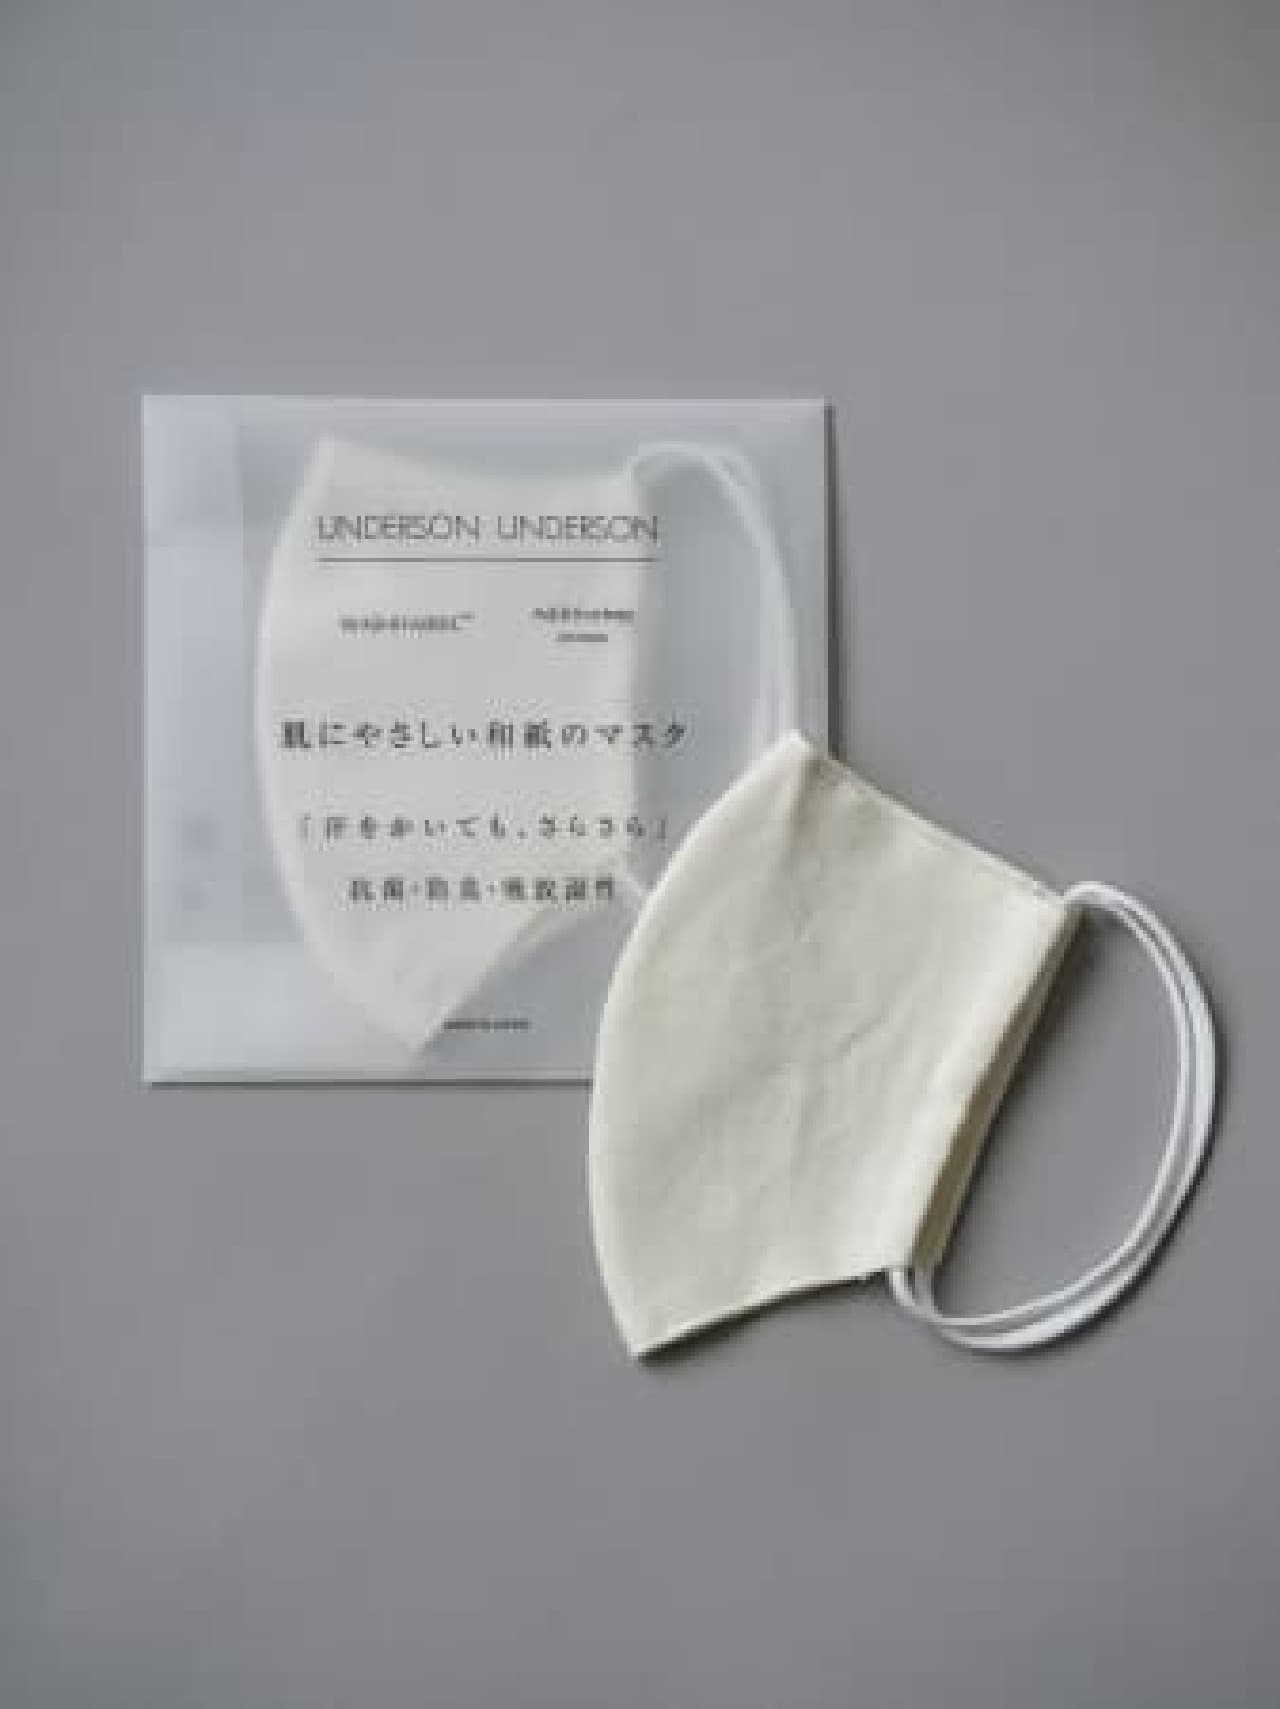 UNDERSON UNDERSON(アンダーソン アンダーソン)オリジナル和紙マスク